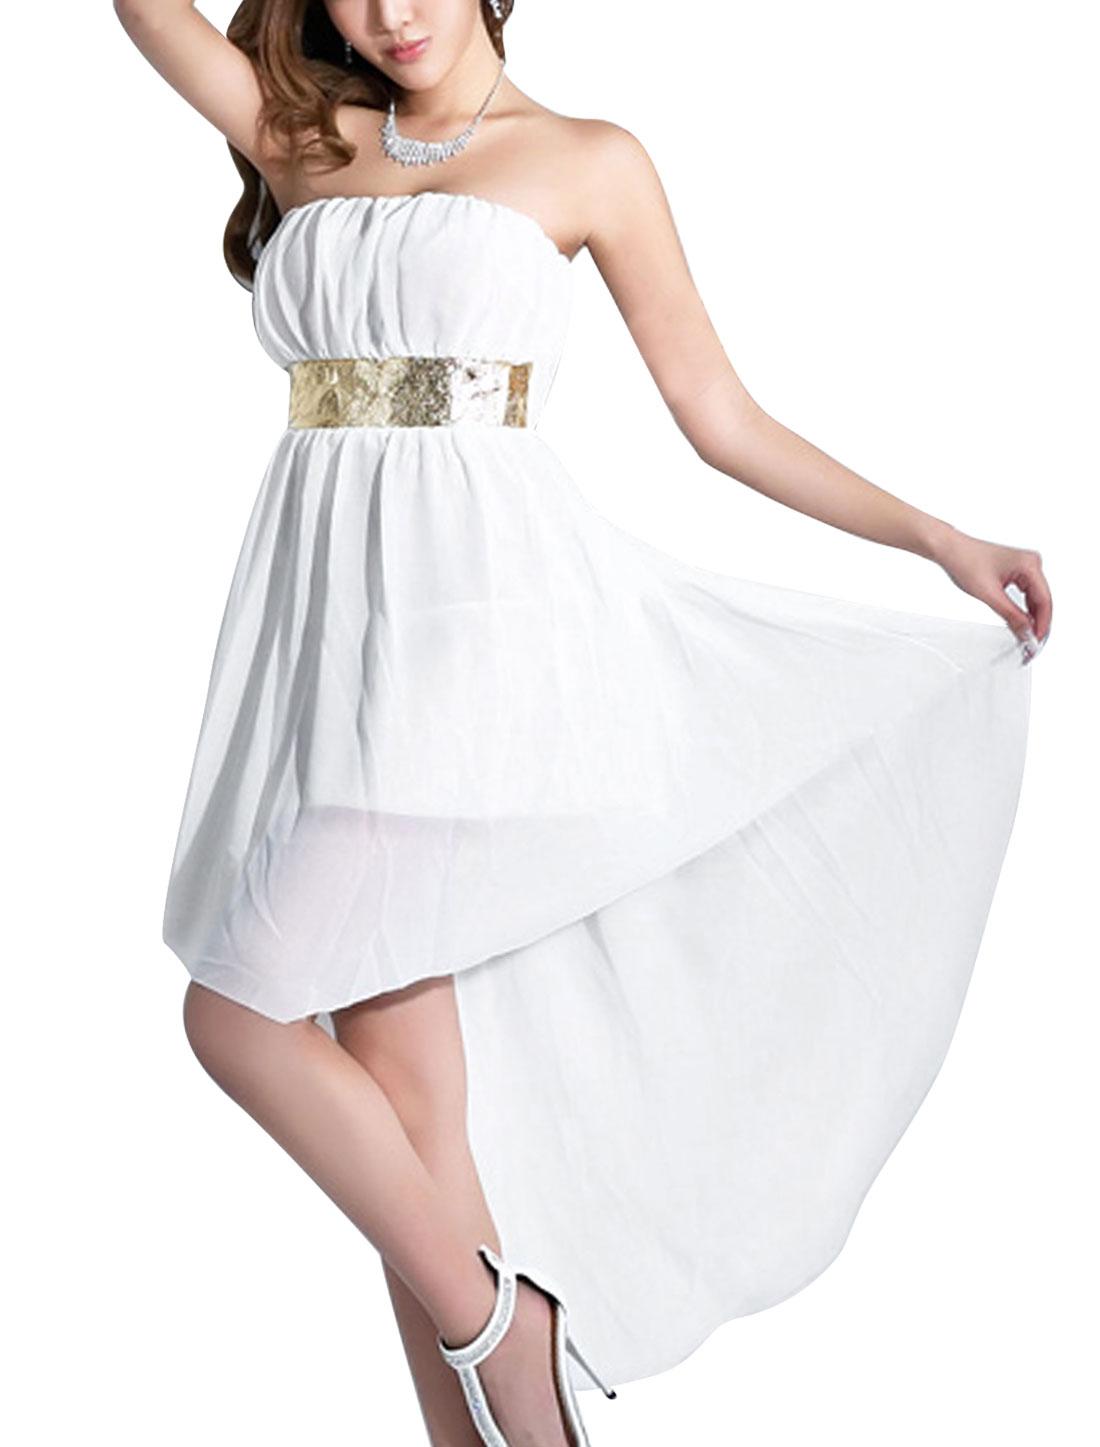 Lady Panel Design Low High Hem Lining Blouson Dress White L